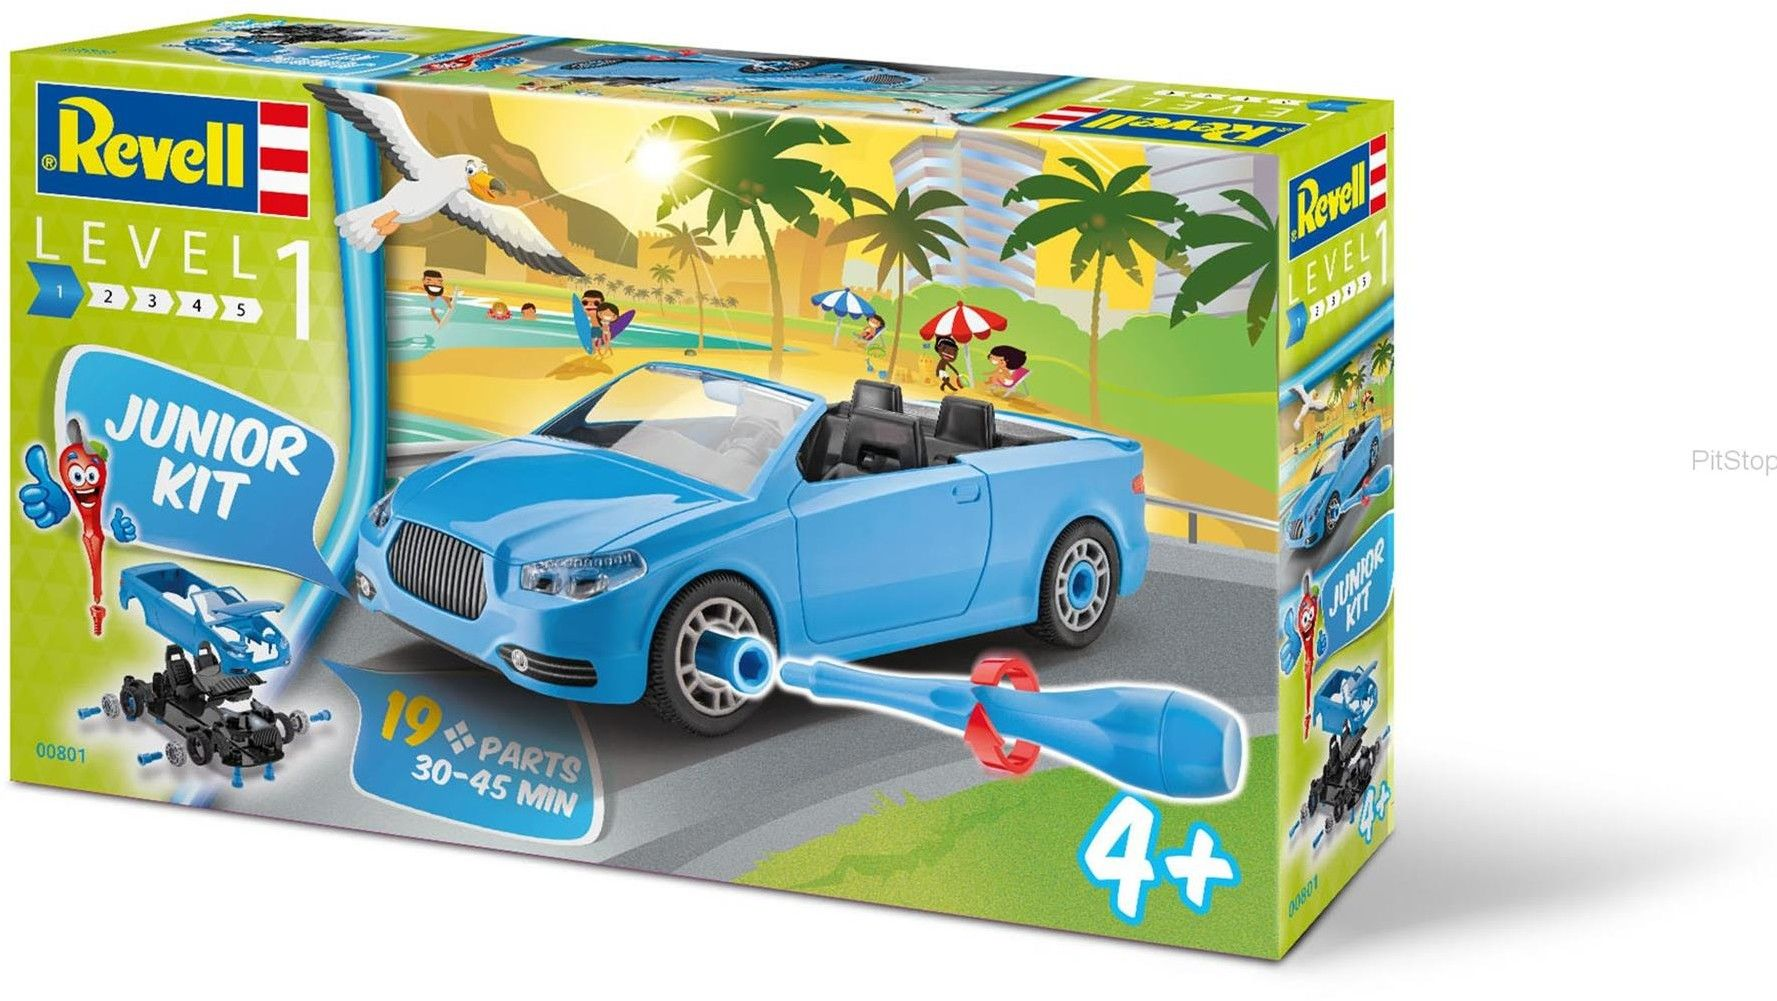 Revell - Junior Kit - Kabriolet